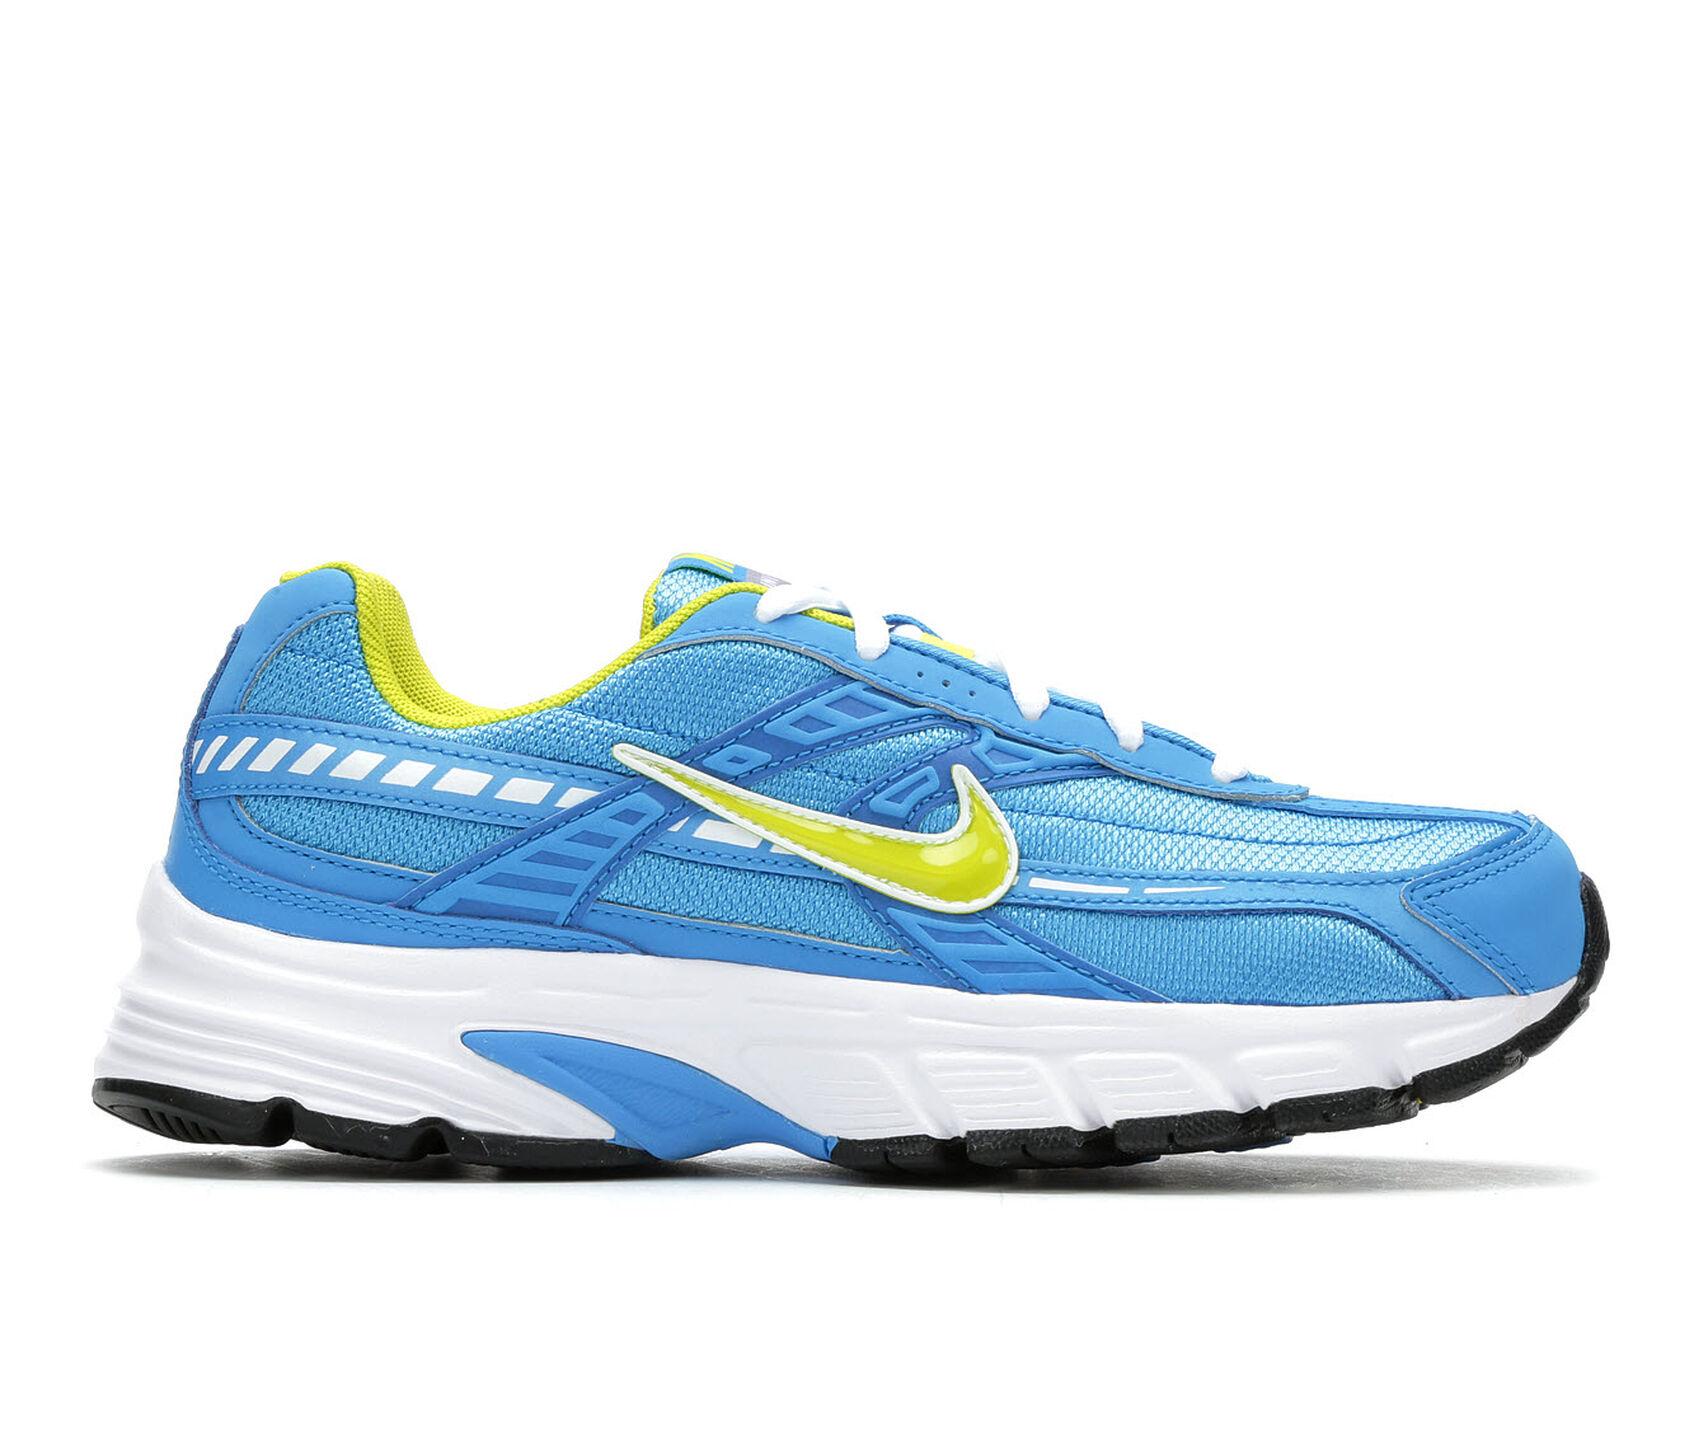 e57a45150146 ... Nike Initiator Running Shoes. Previous